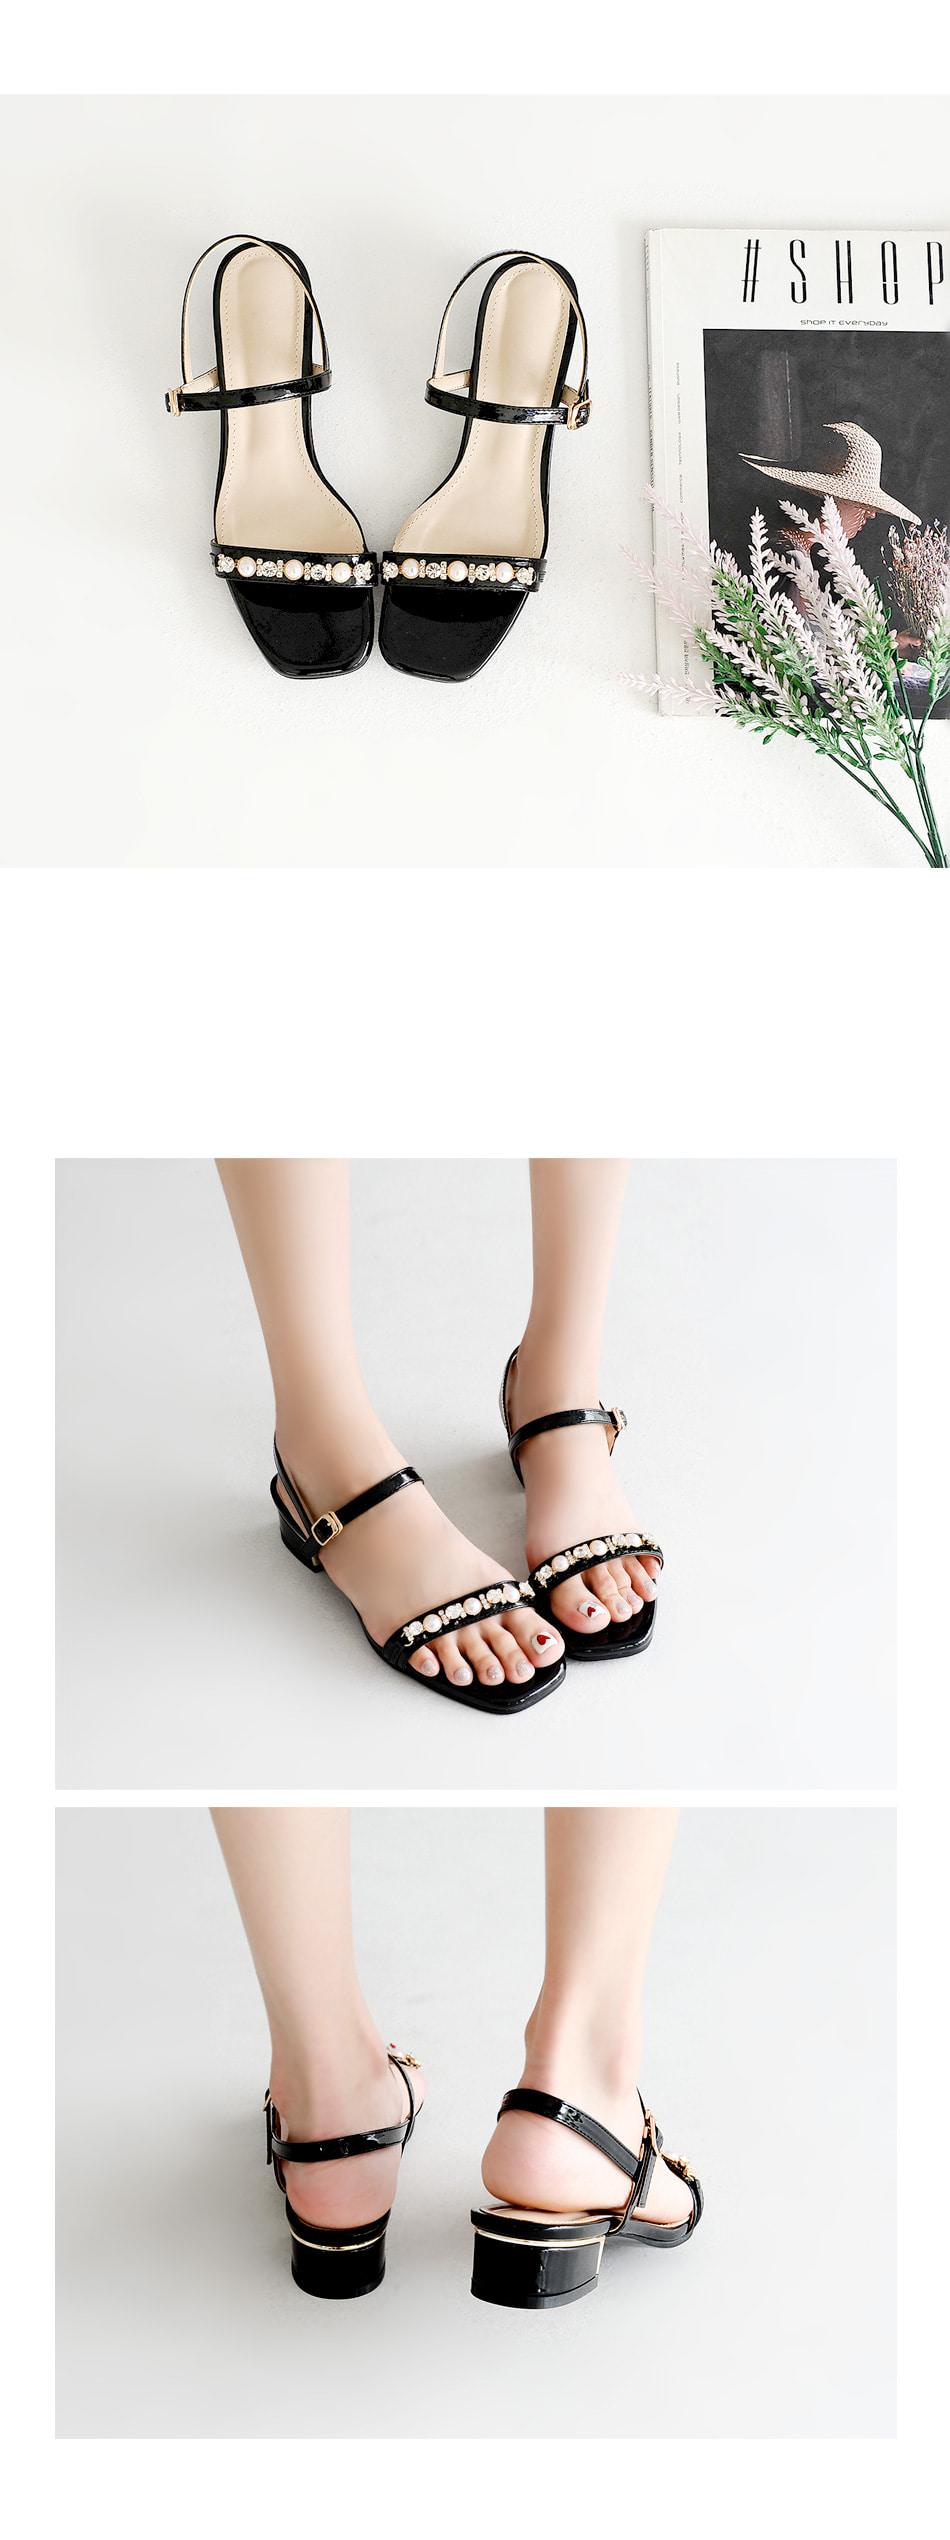 Lacey Slingback Sandals 3cm